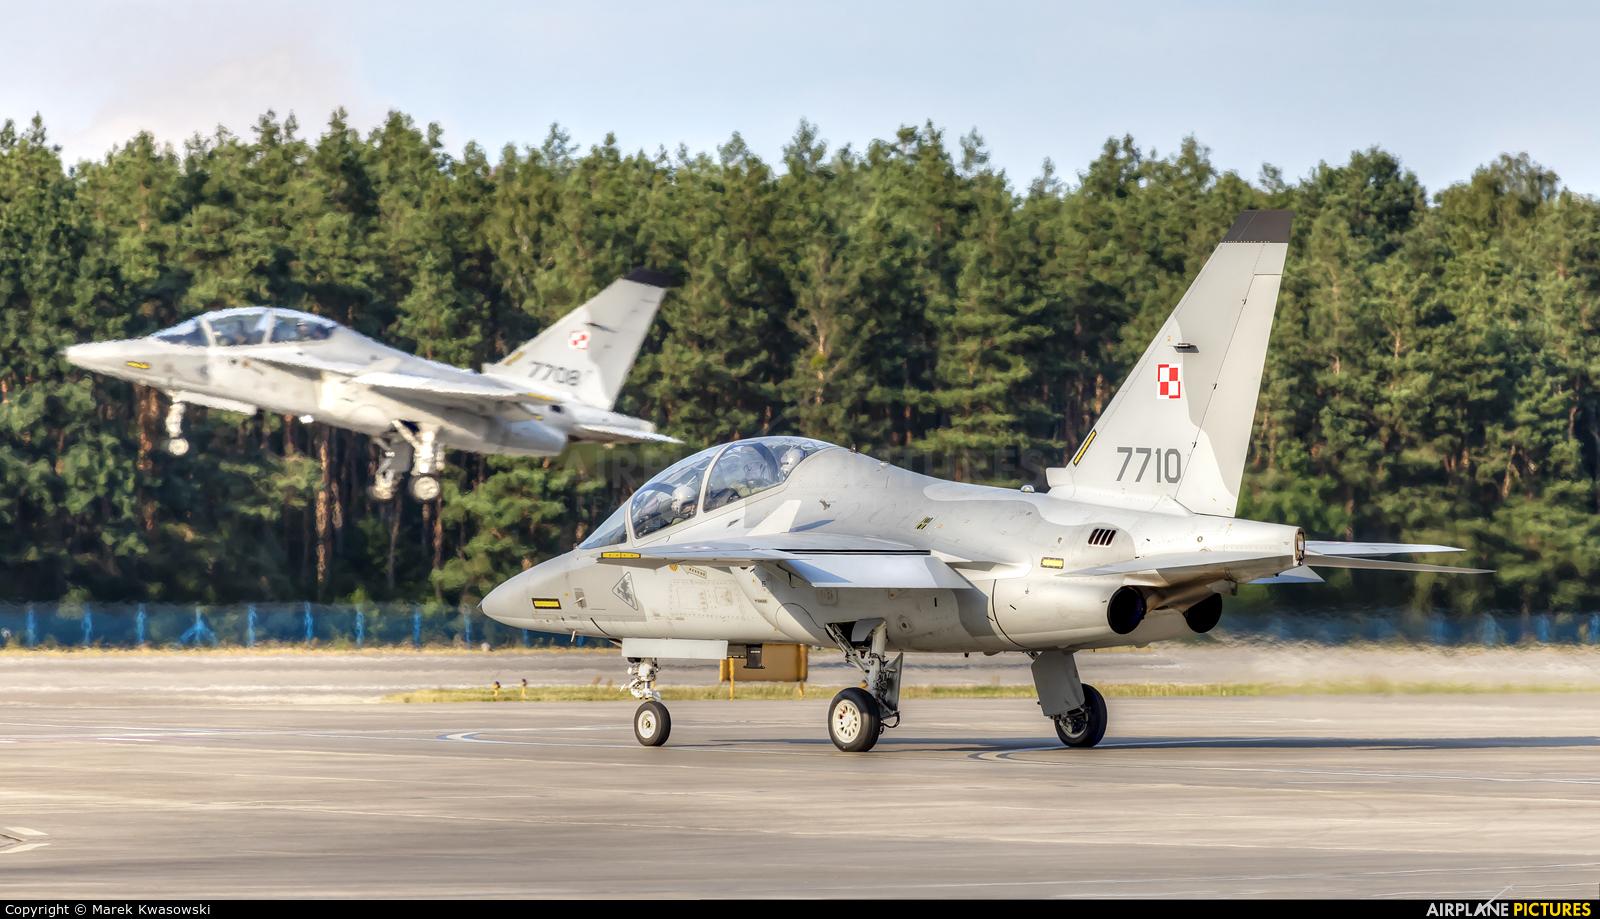 Poland - Air Force 7710 aircraft at Dęblin - Museum of Polish Air Force